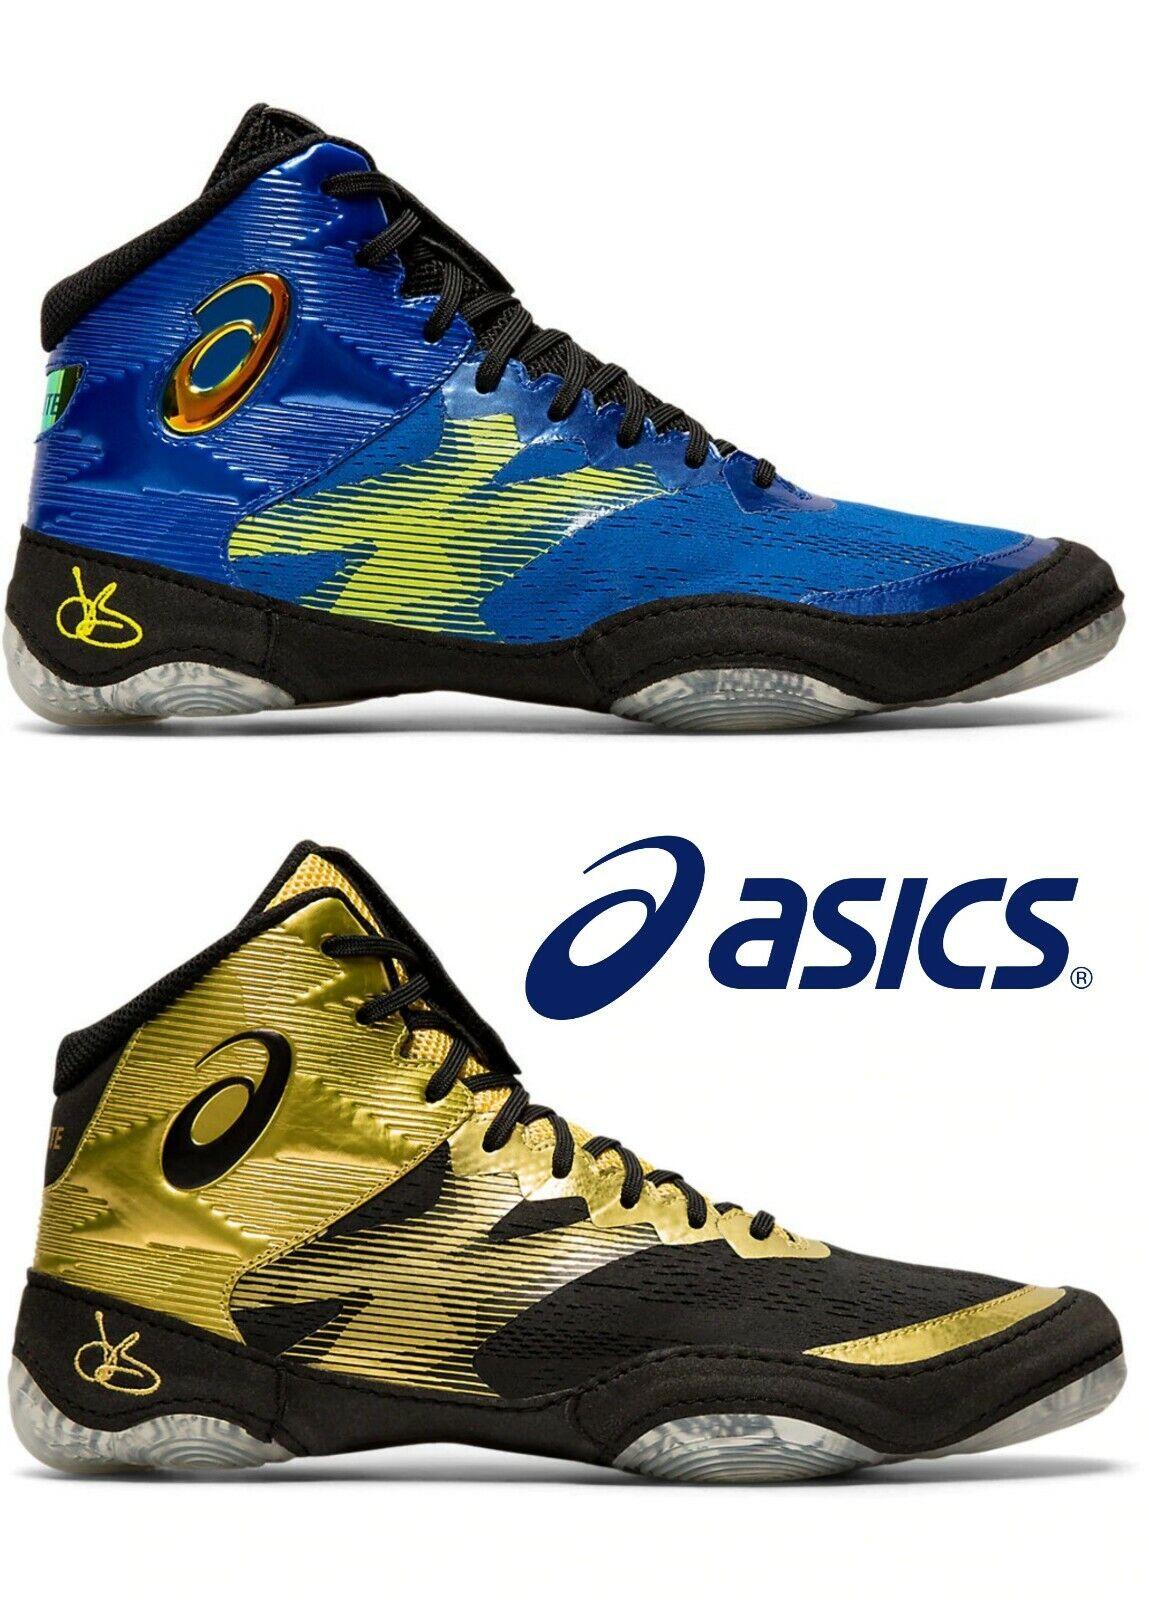 Asics JB Elite IV Wrestling scarpe Scarpe da boxe Scarpe da Lotta